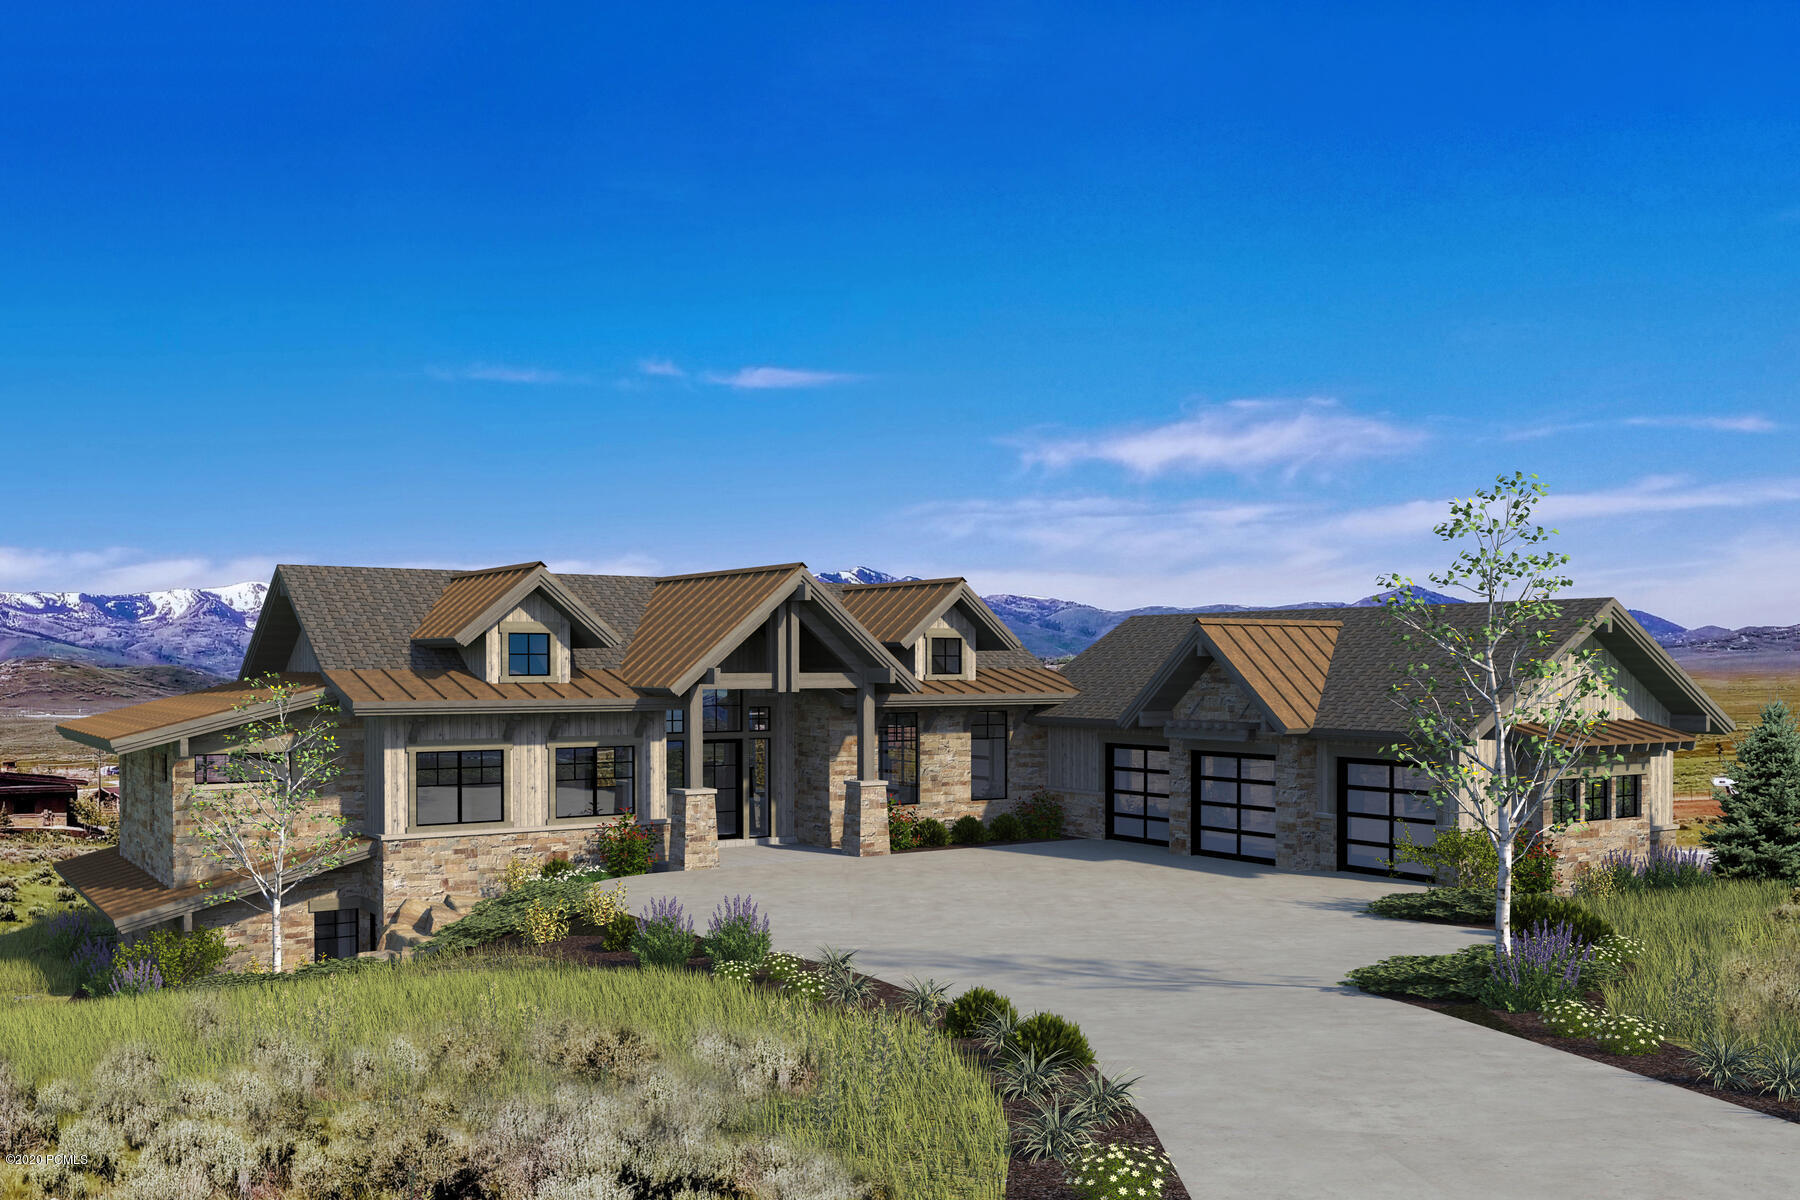 2563 Julia Court, Park City, Utah 84098, 5 Bedrooms Bedrooms, ,5 BathroomsBathrooms,Single Family,For Sale,Julia,12002745